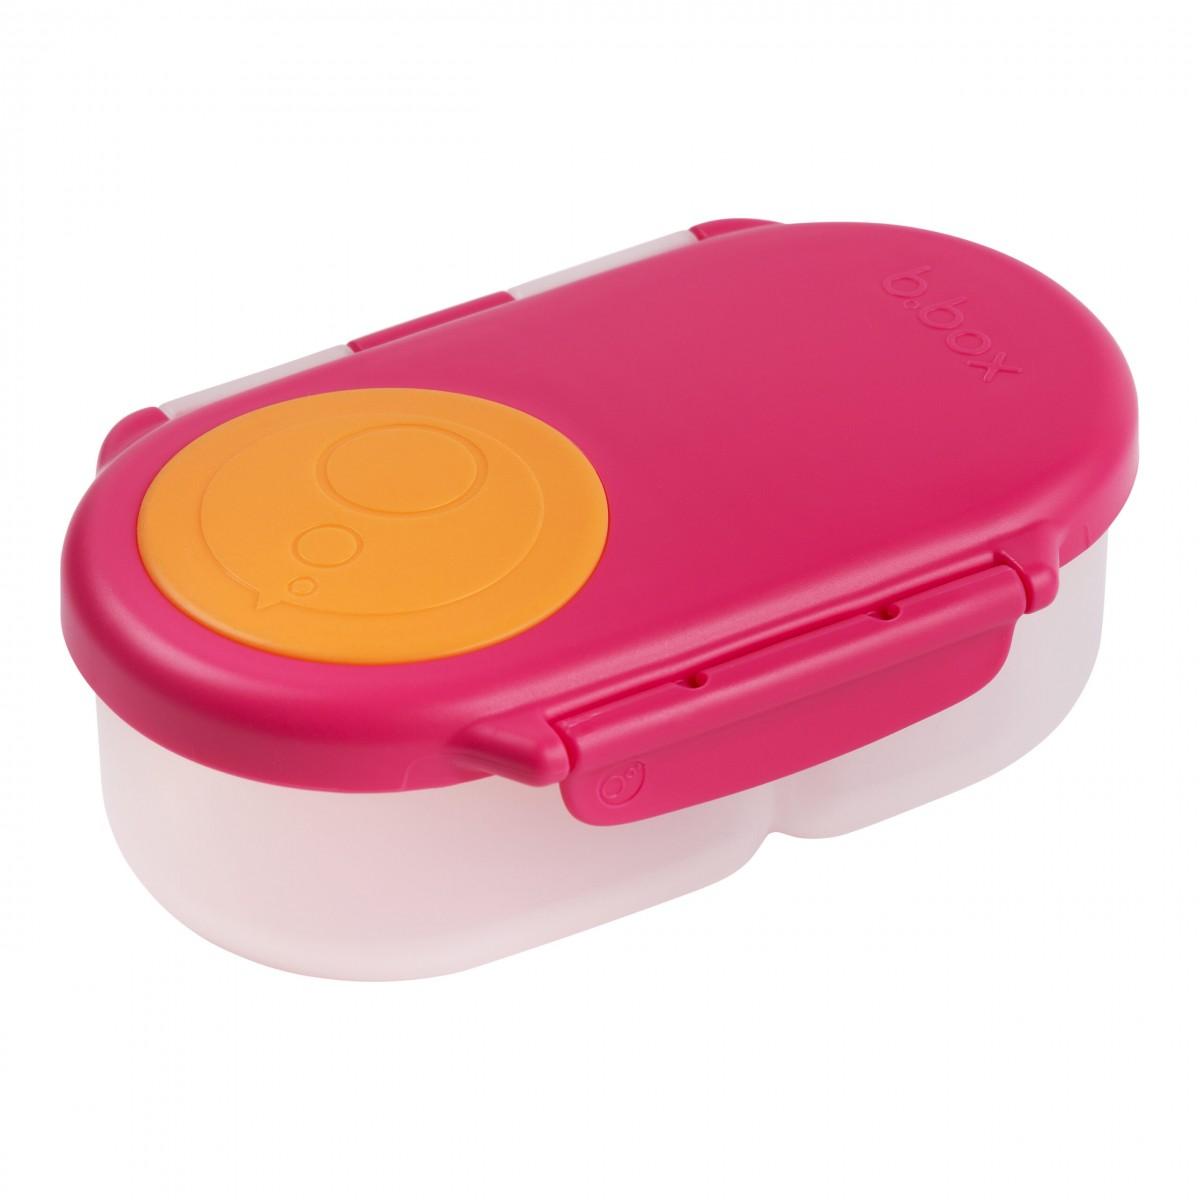 Snack Box Strawberry Shake Pink Orange